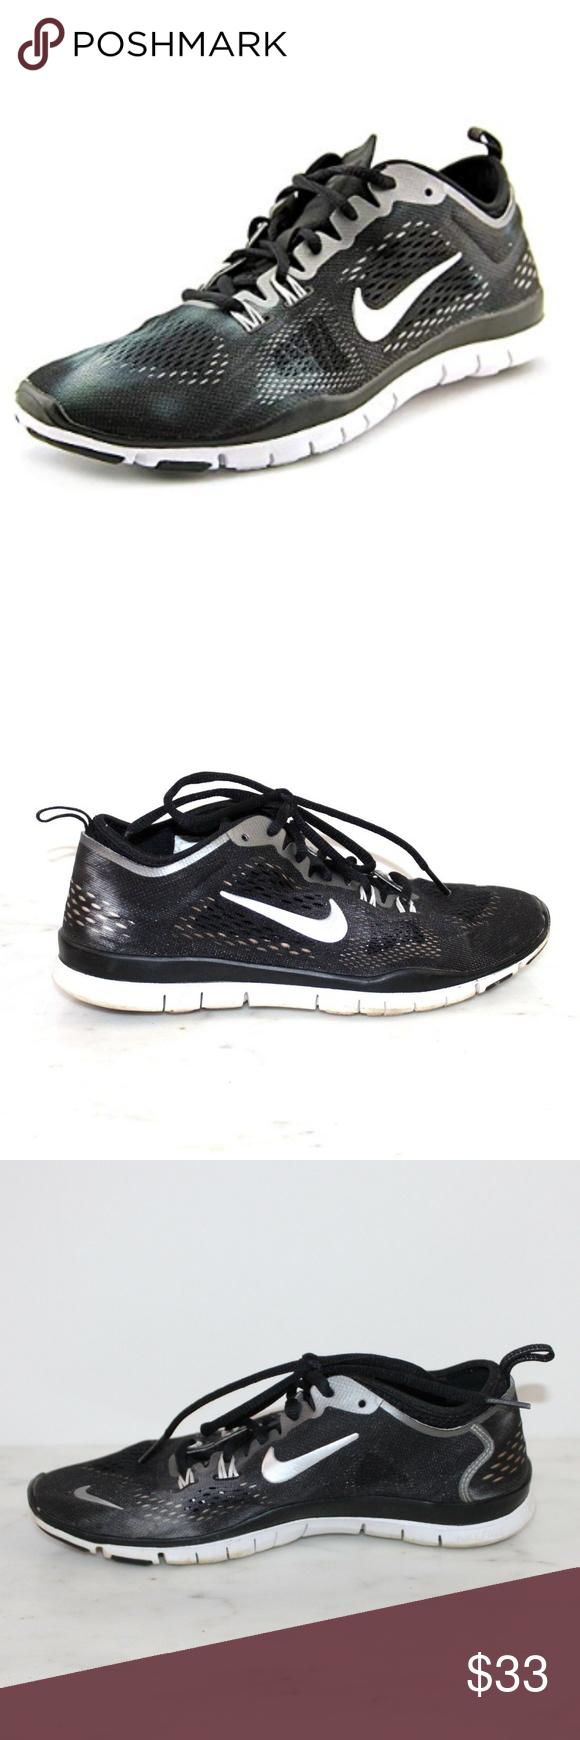 2352997e528b2 Nike  Free 5.0 TR Fit 4 Tie Dye Run 653988-001 Nike Free 5.0 TR Fit ...